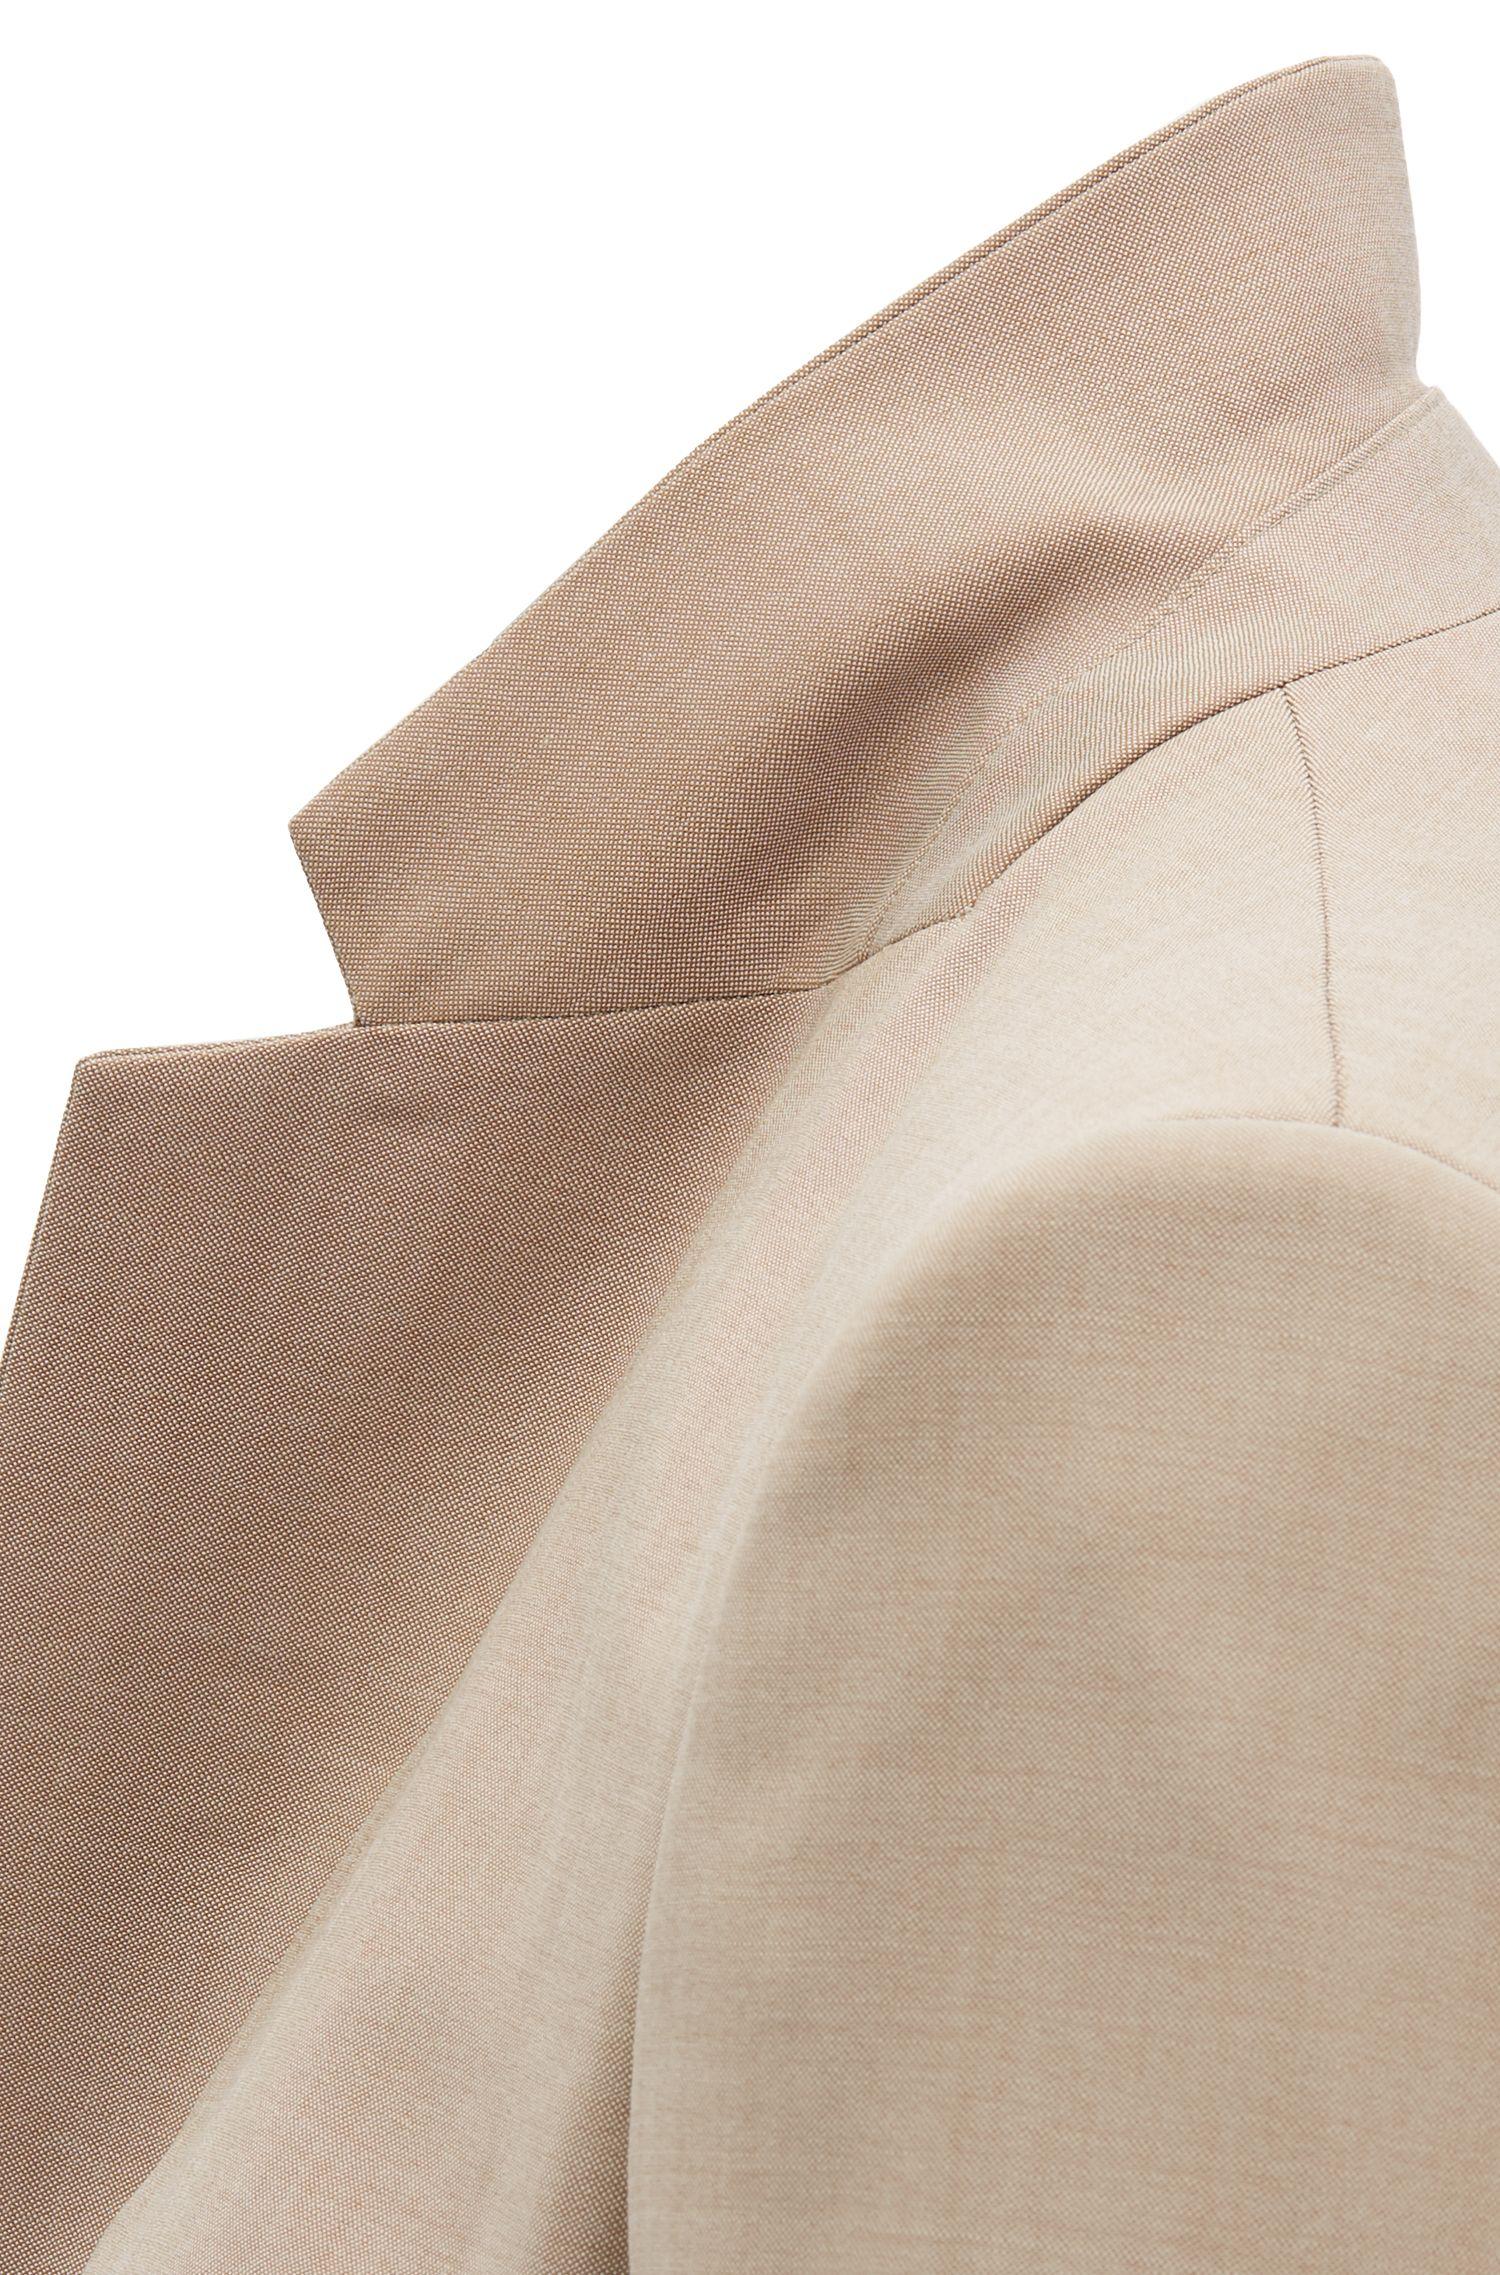 Regular-fit jacket in virgin wool with sharkskin texture, Beige